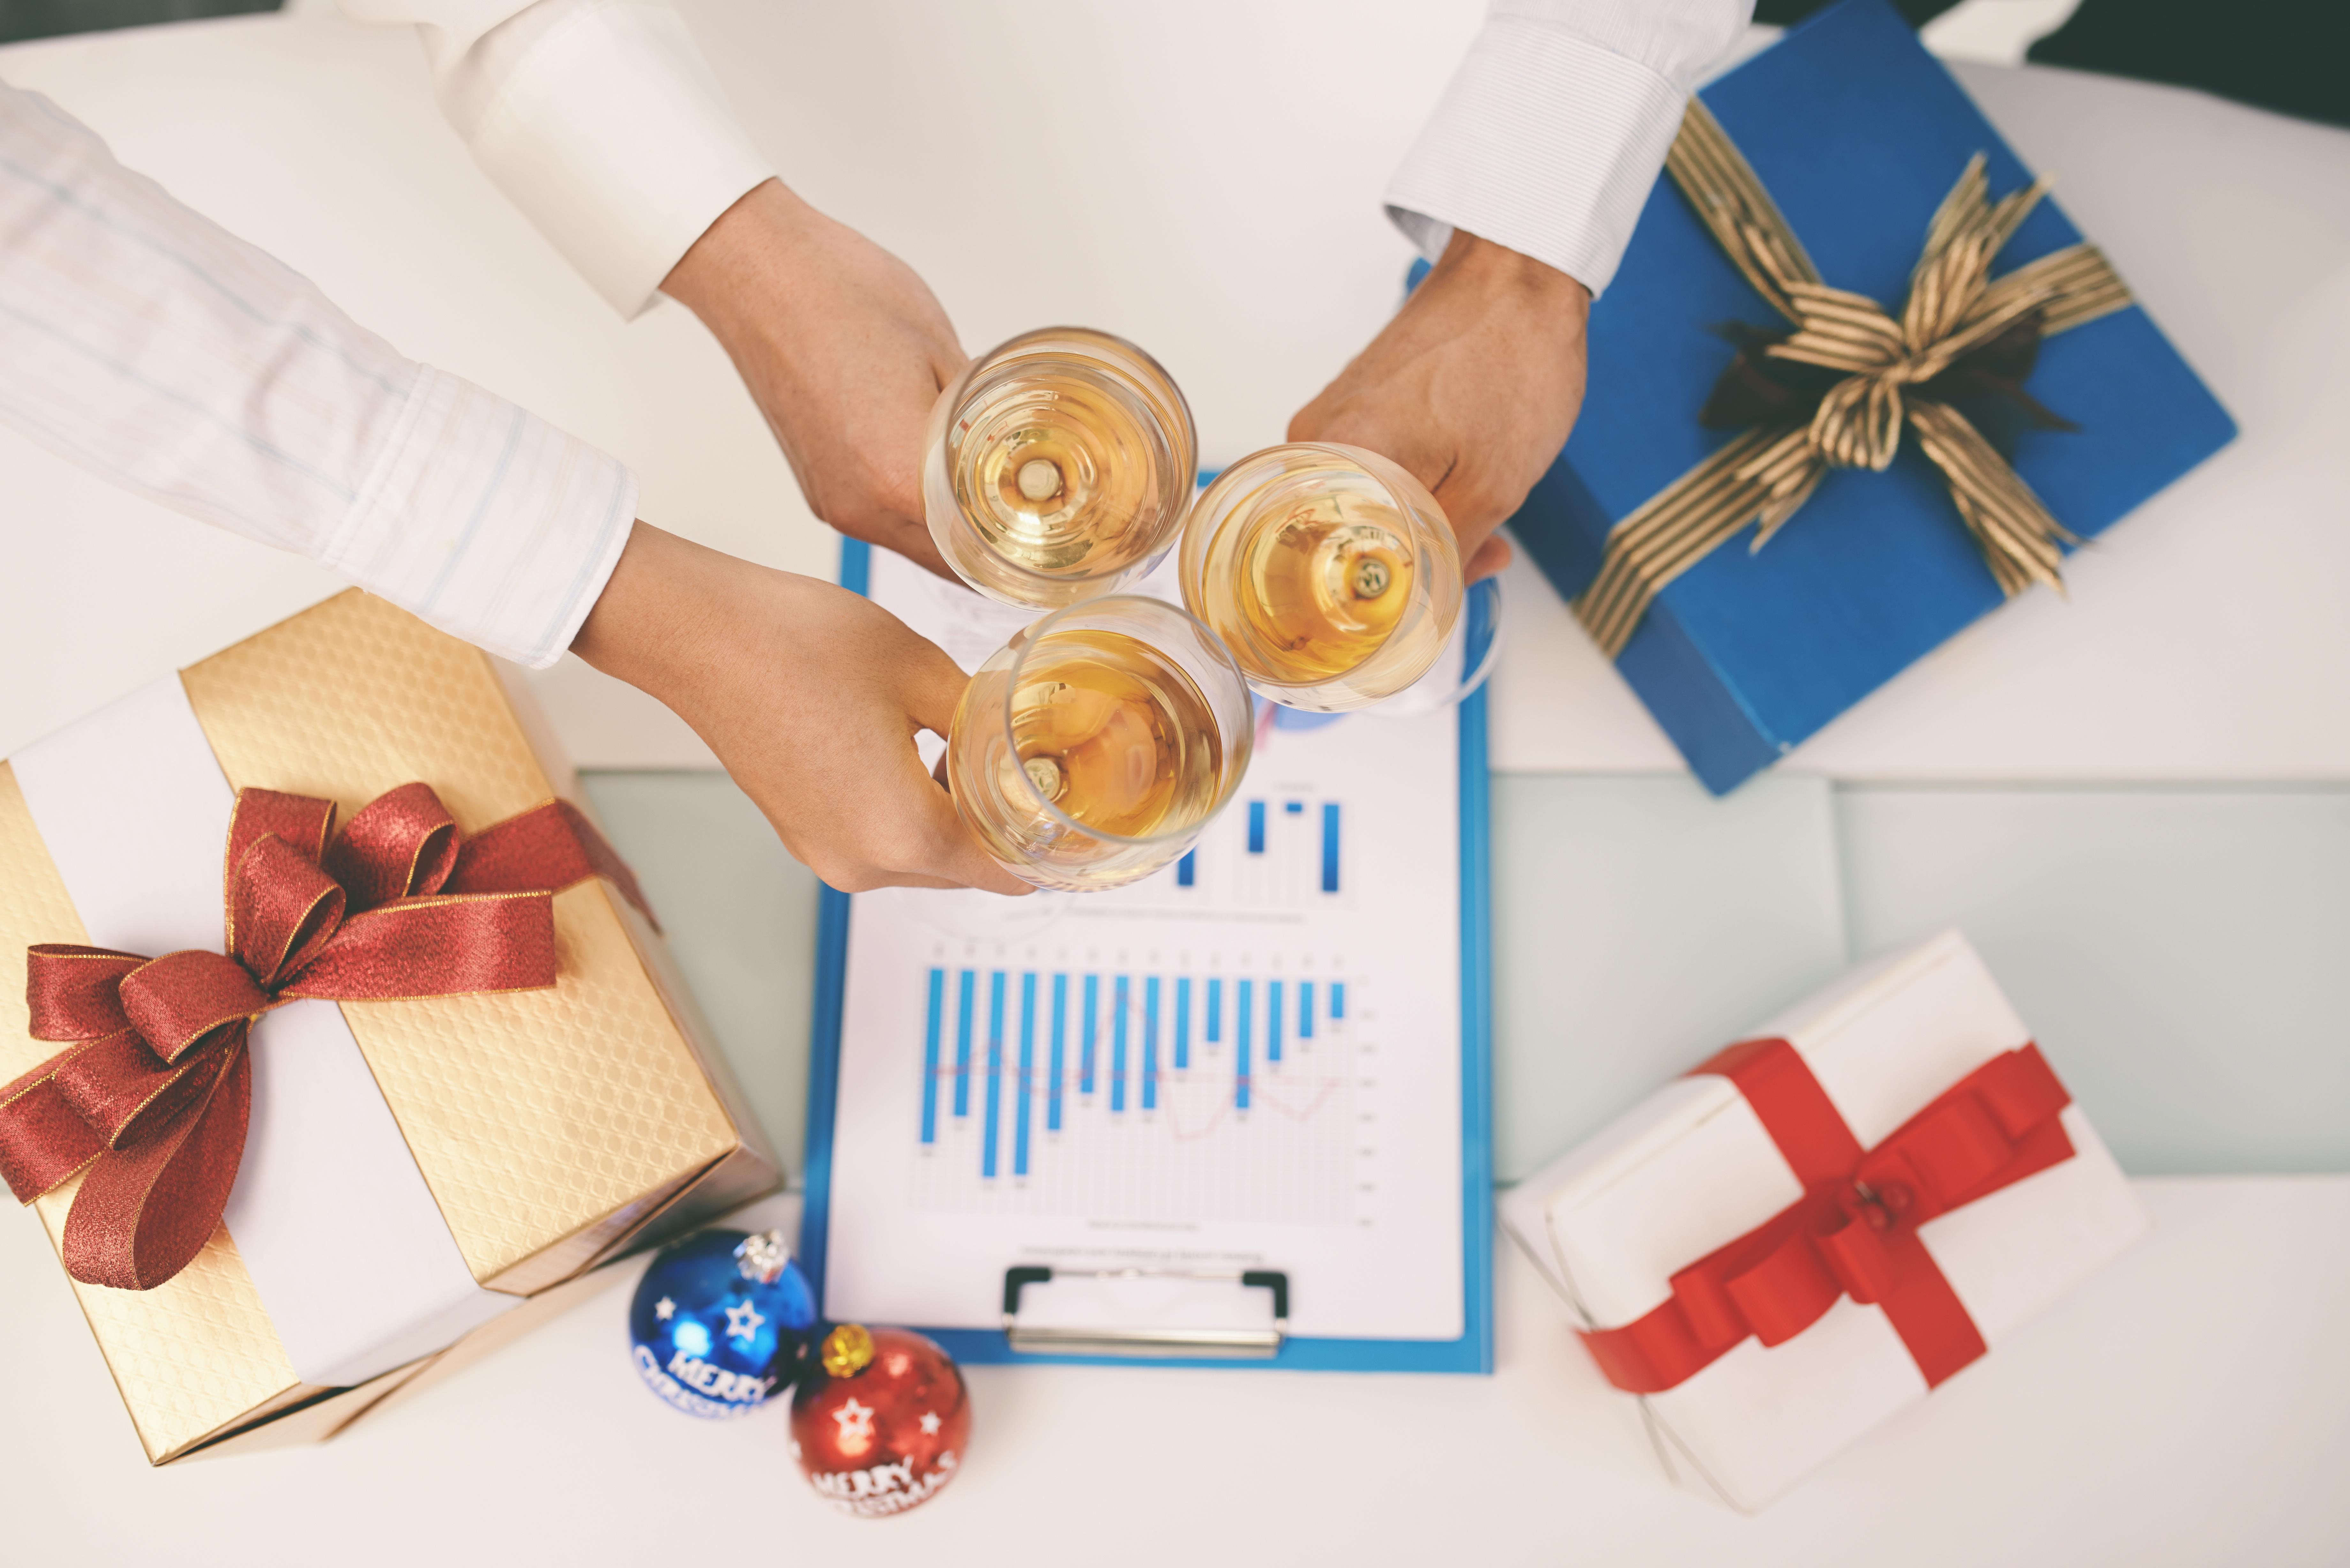 blog tara wyborny office holiday party etiquette